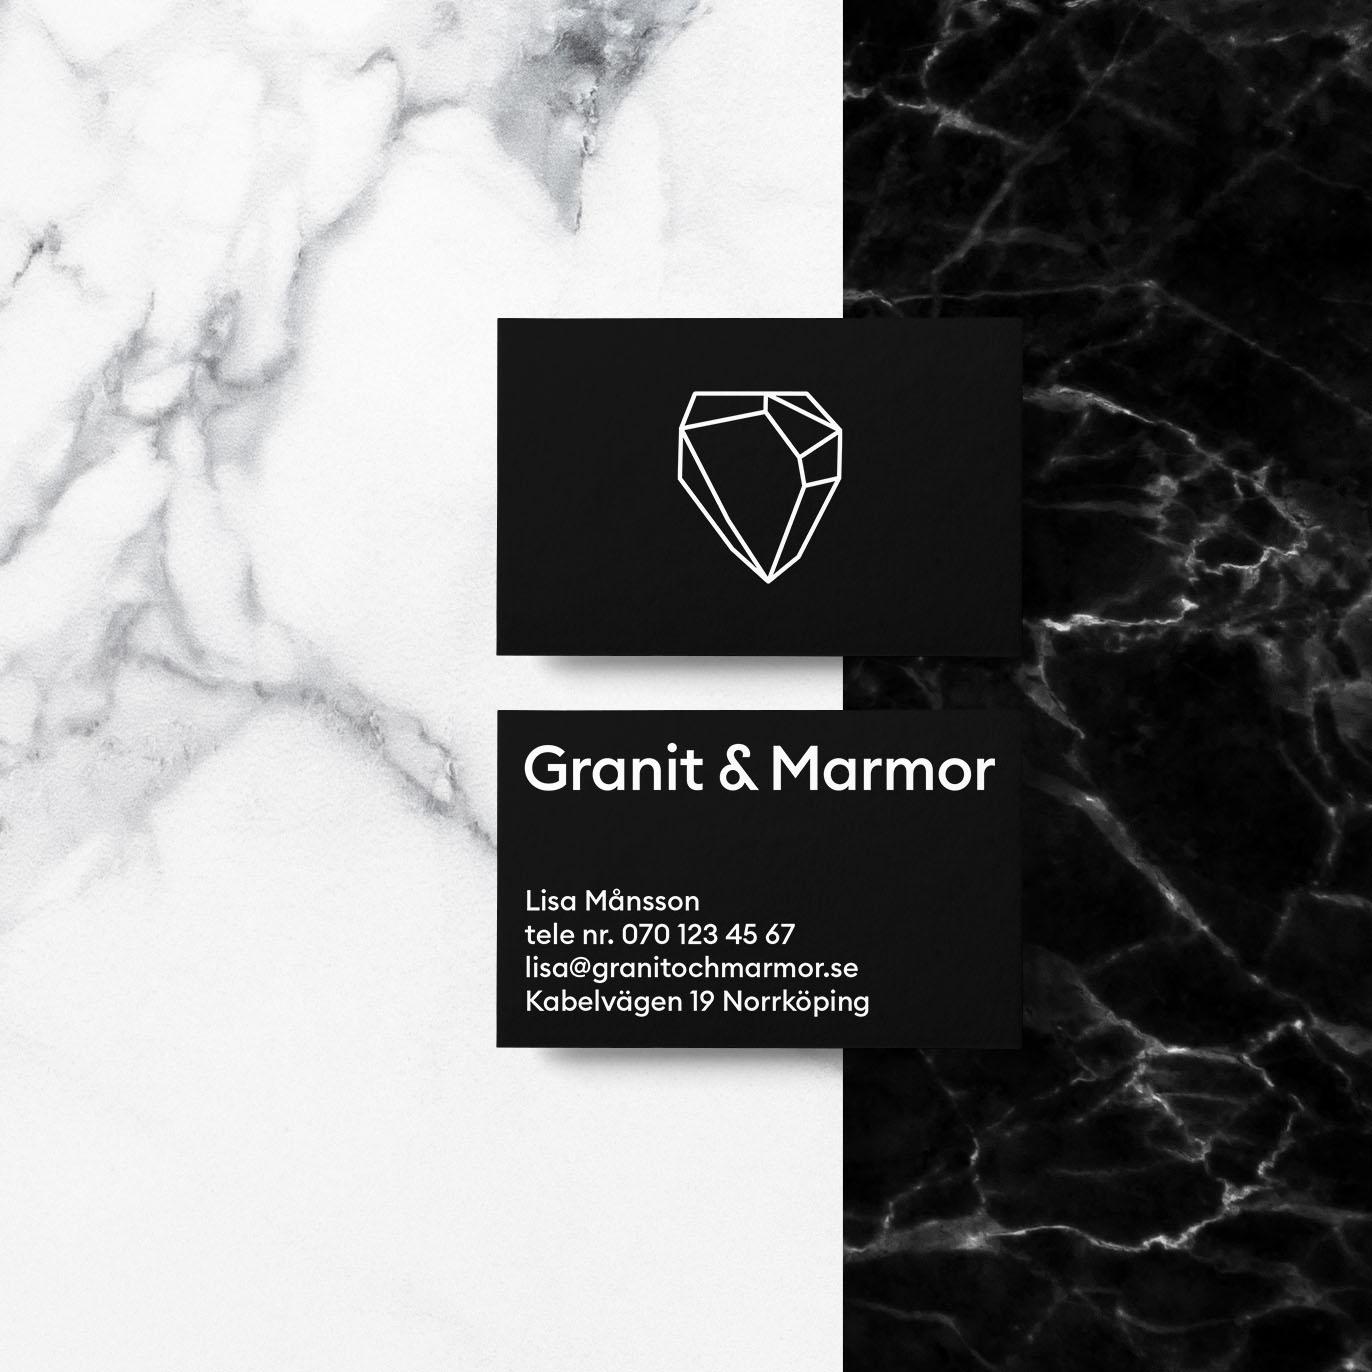 Granit & Marmor